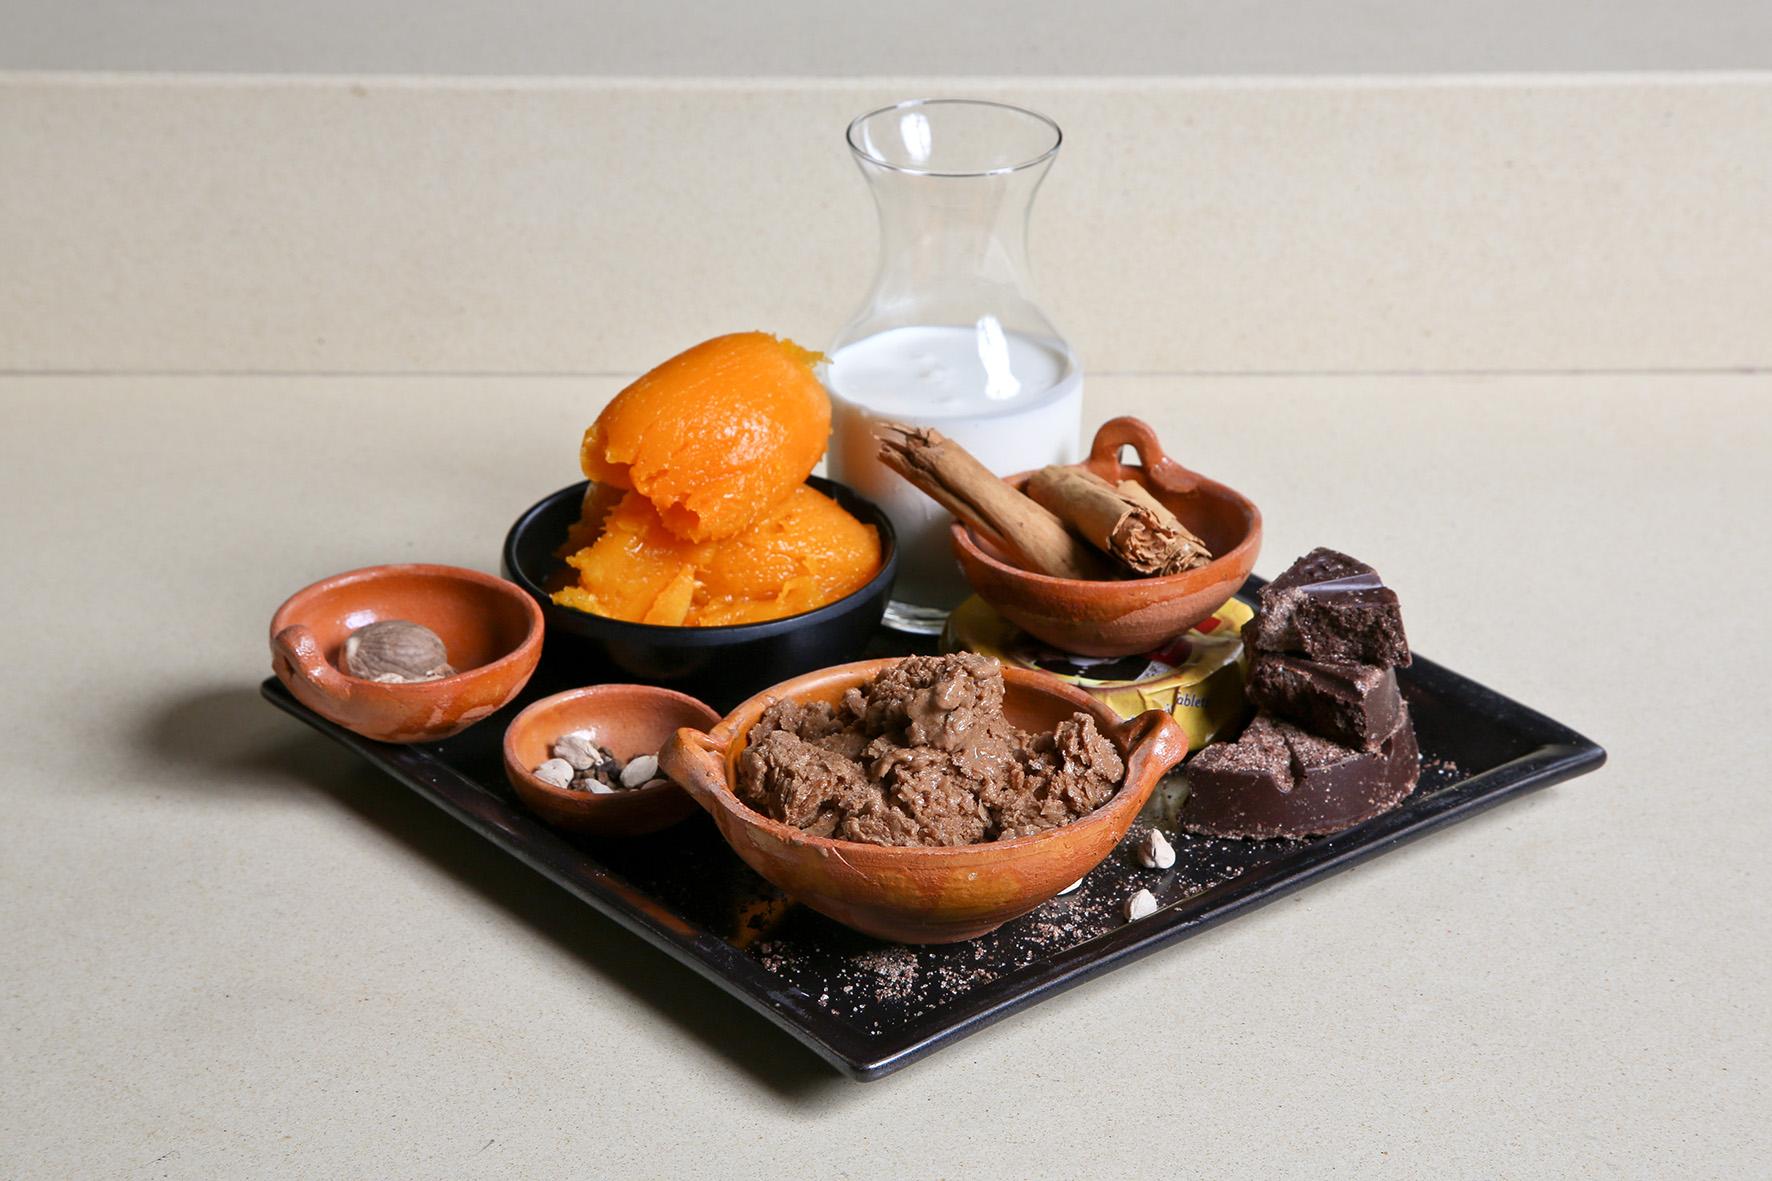 NBM_33_Chefs_Sol Cucina_Squash Ice Cream_By Jody Tiongco-19